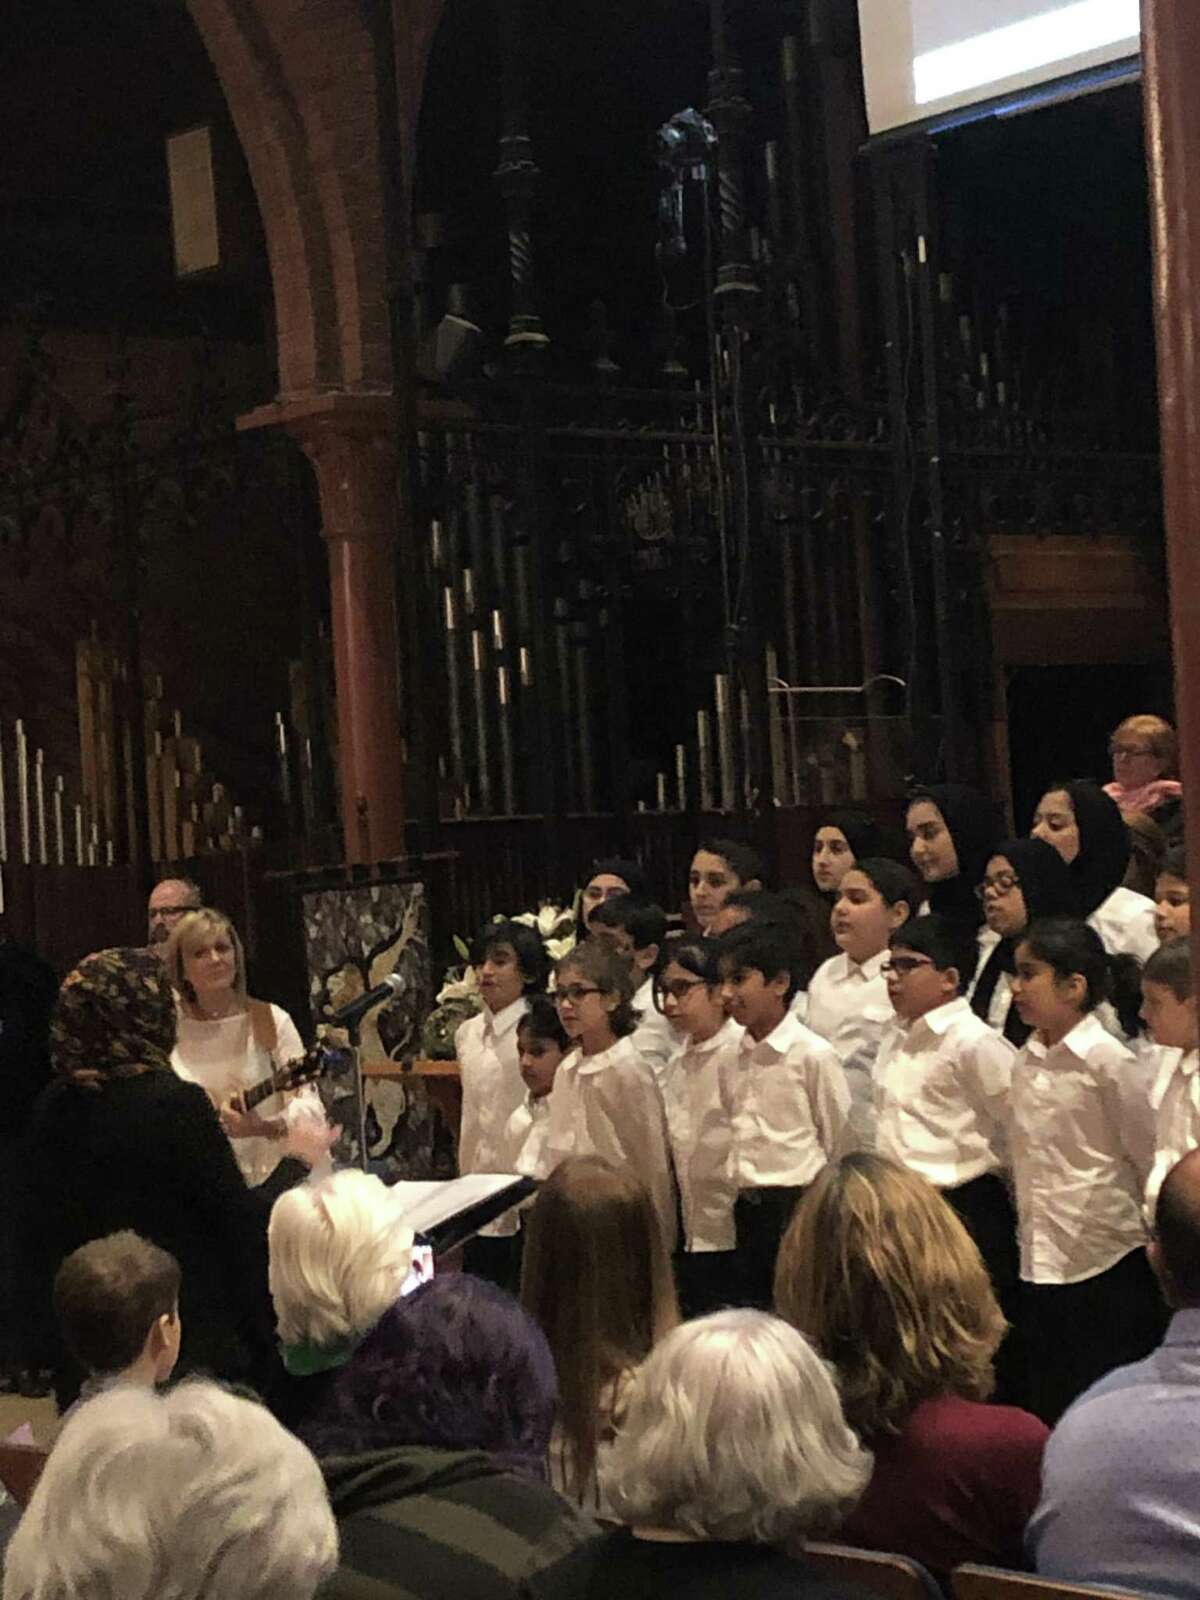 ADAMS Best Choir, a D.C.-area youth choir, performs